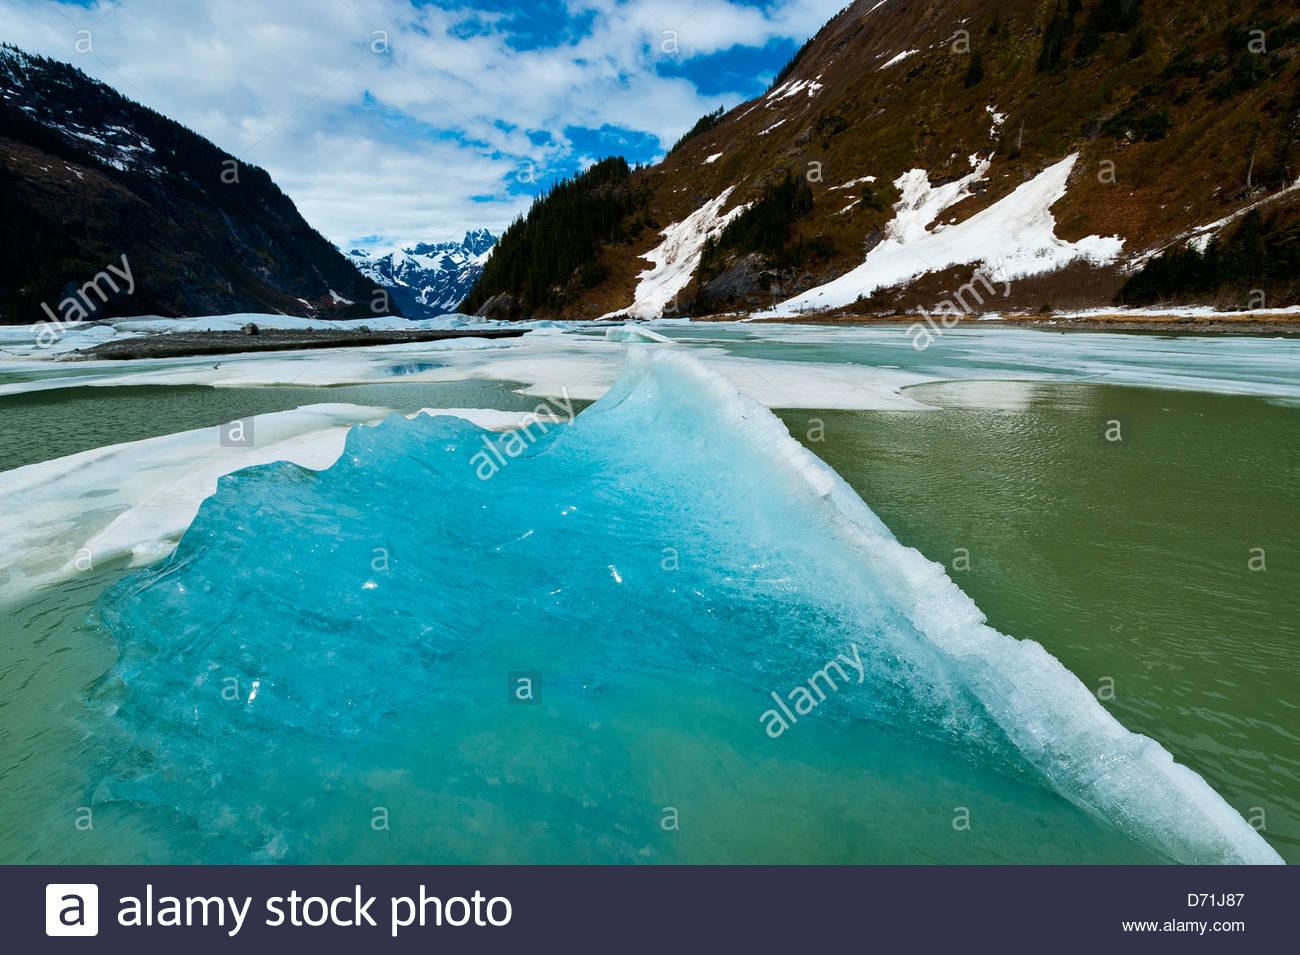 Shakes Slough, a tributary of the Stikine RIver, Stikine LeConte Wilderness, Southeast Alaska USA - Stock Image